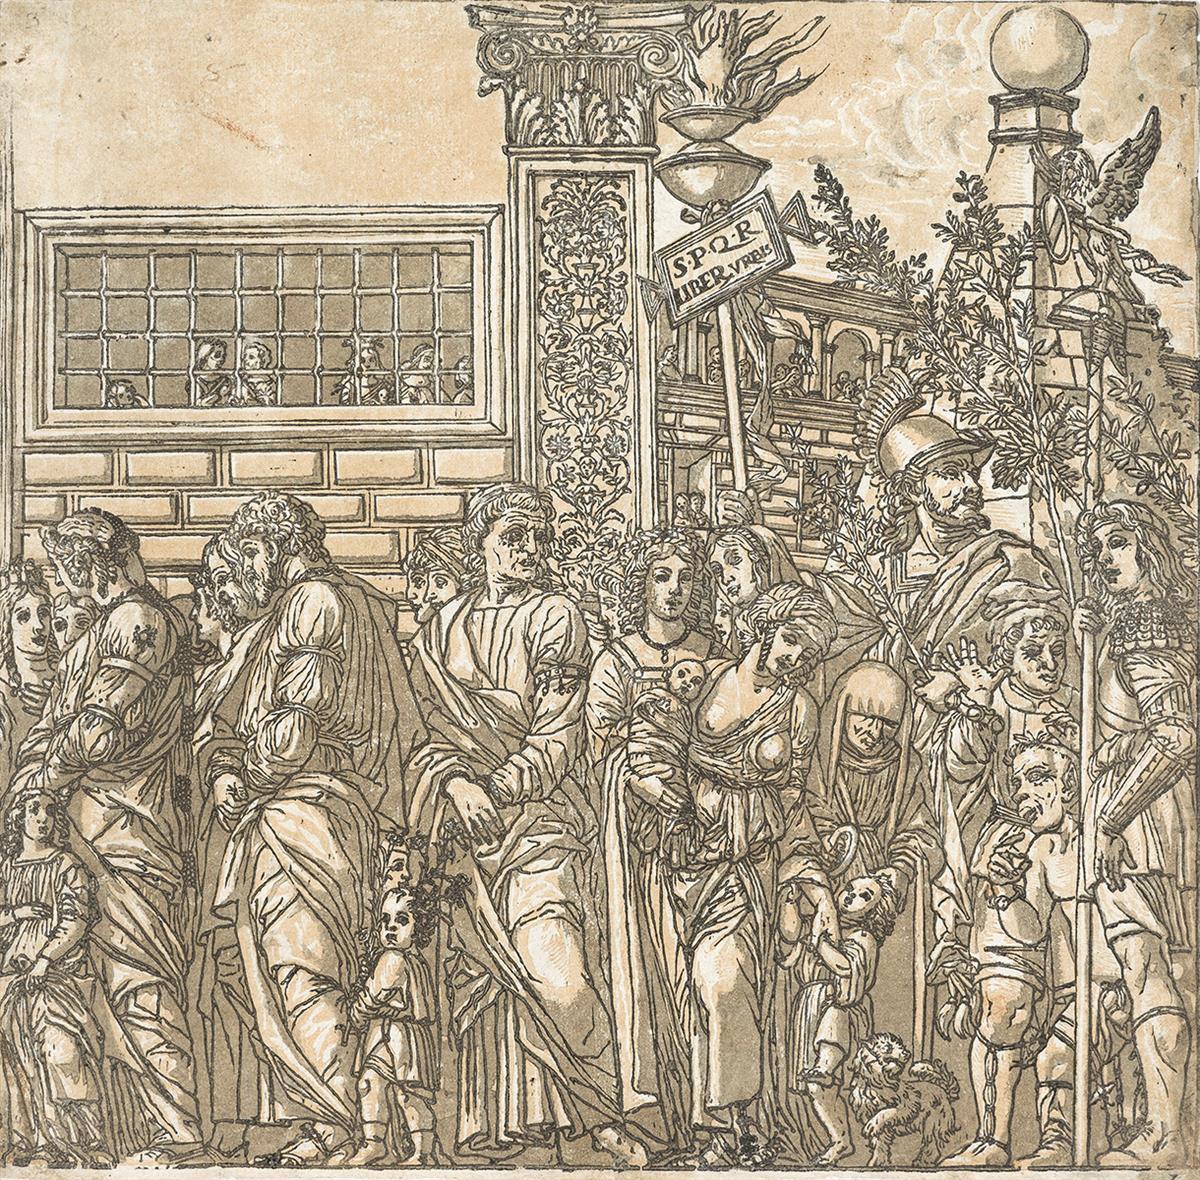 ANDREA ANDREANI (after Mantegna) The Triumph of Julius Caesar